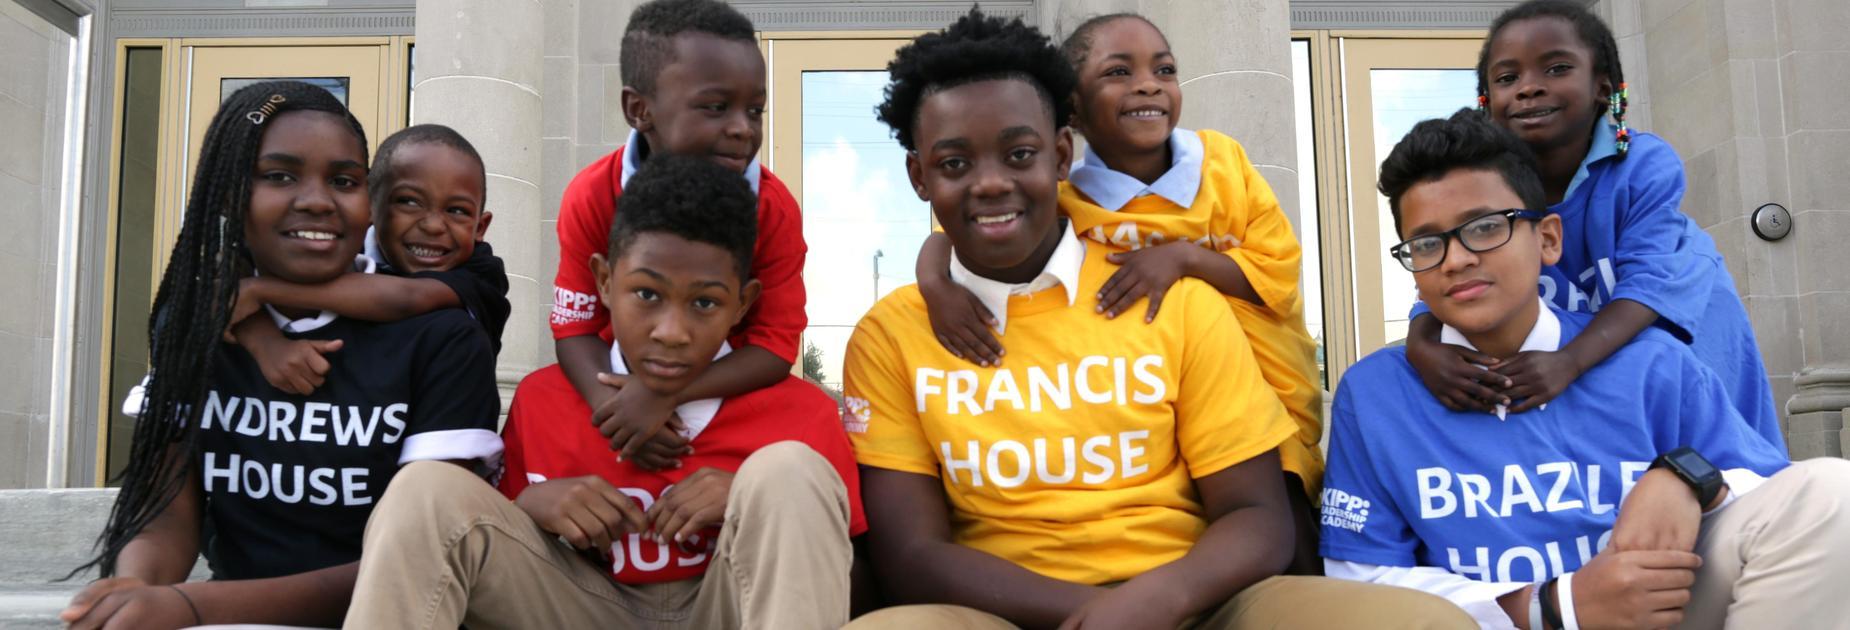 4 KLP and 4 KLA students wearing house T-shirts